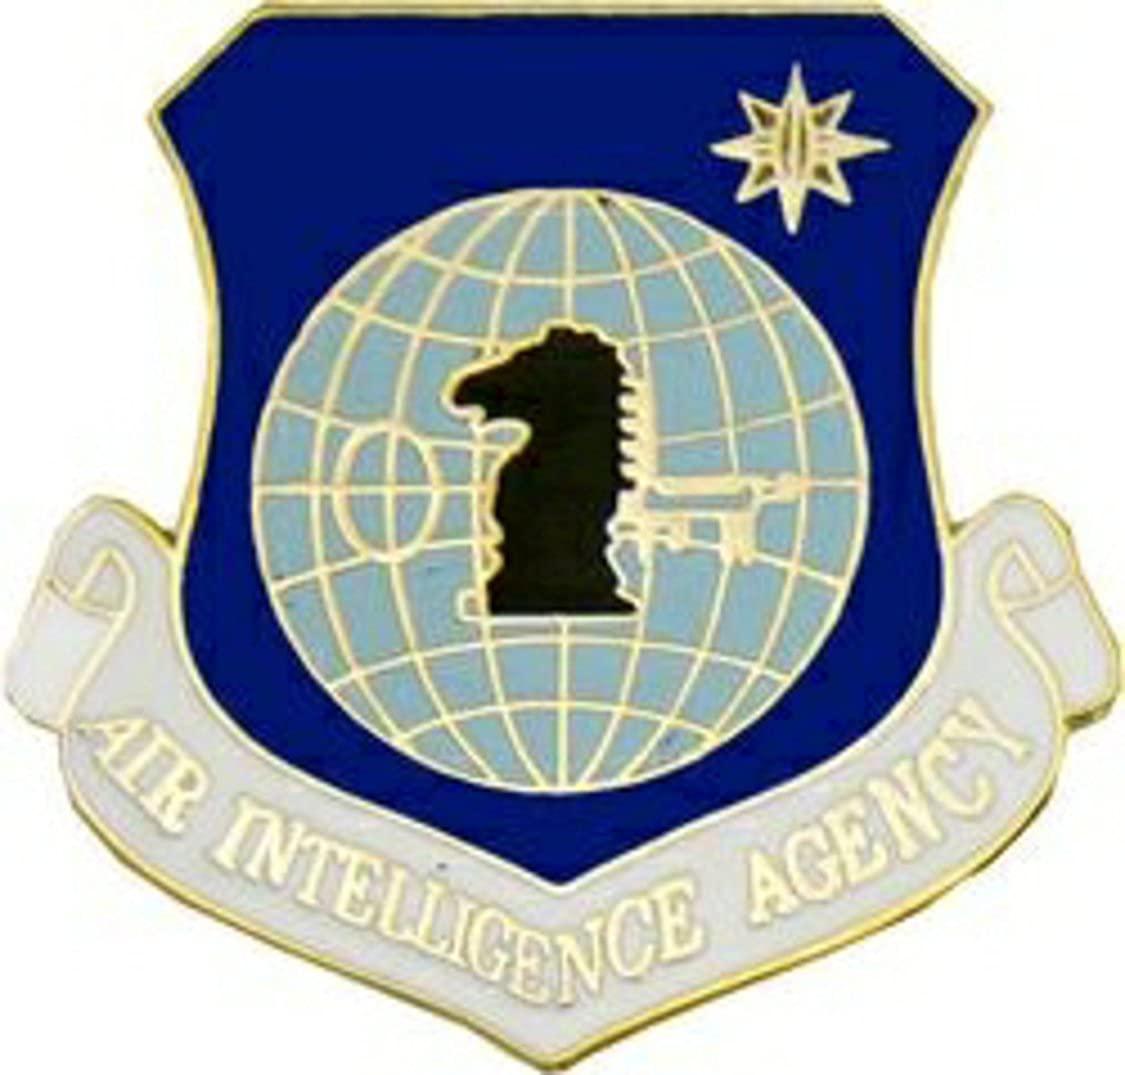 US Air Force Air Intelligence Agency Lapel Pin or Hat Pin (metal, 1 1/8